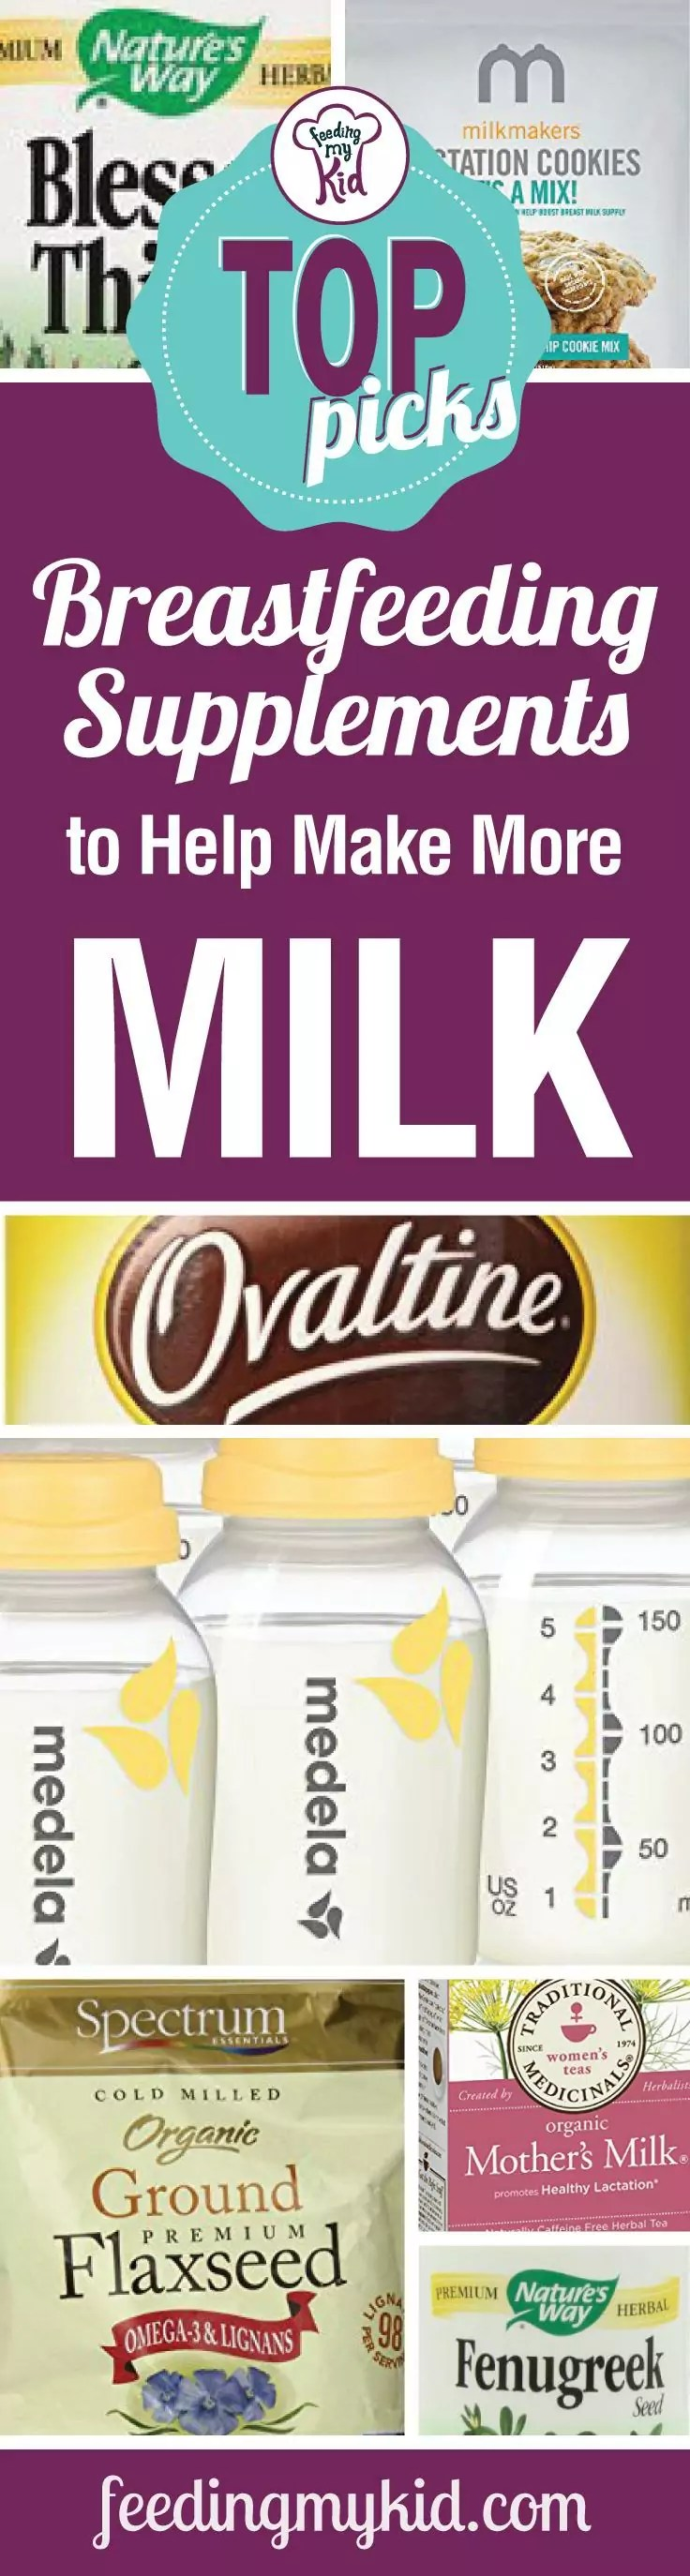 Top Picks Breastfeeding Supplements To Help Make More Milk